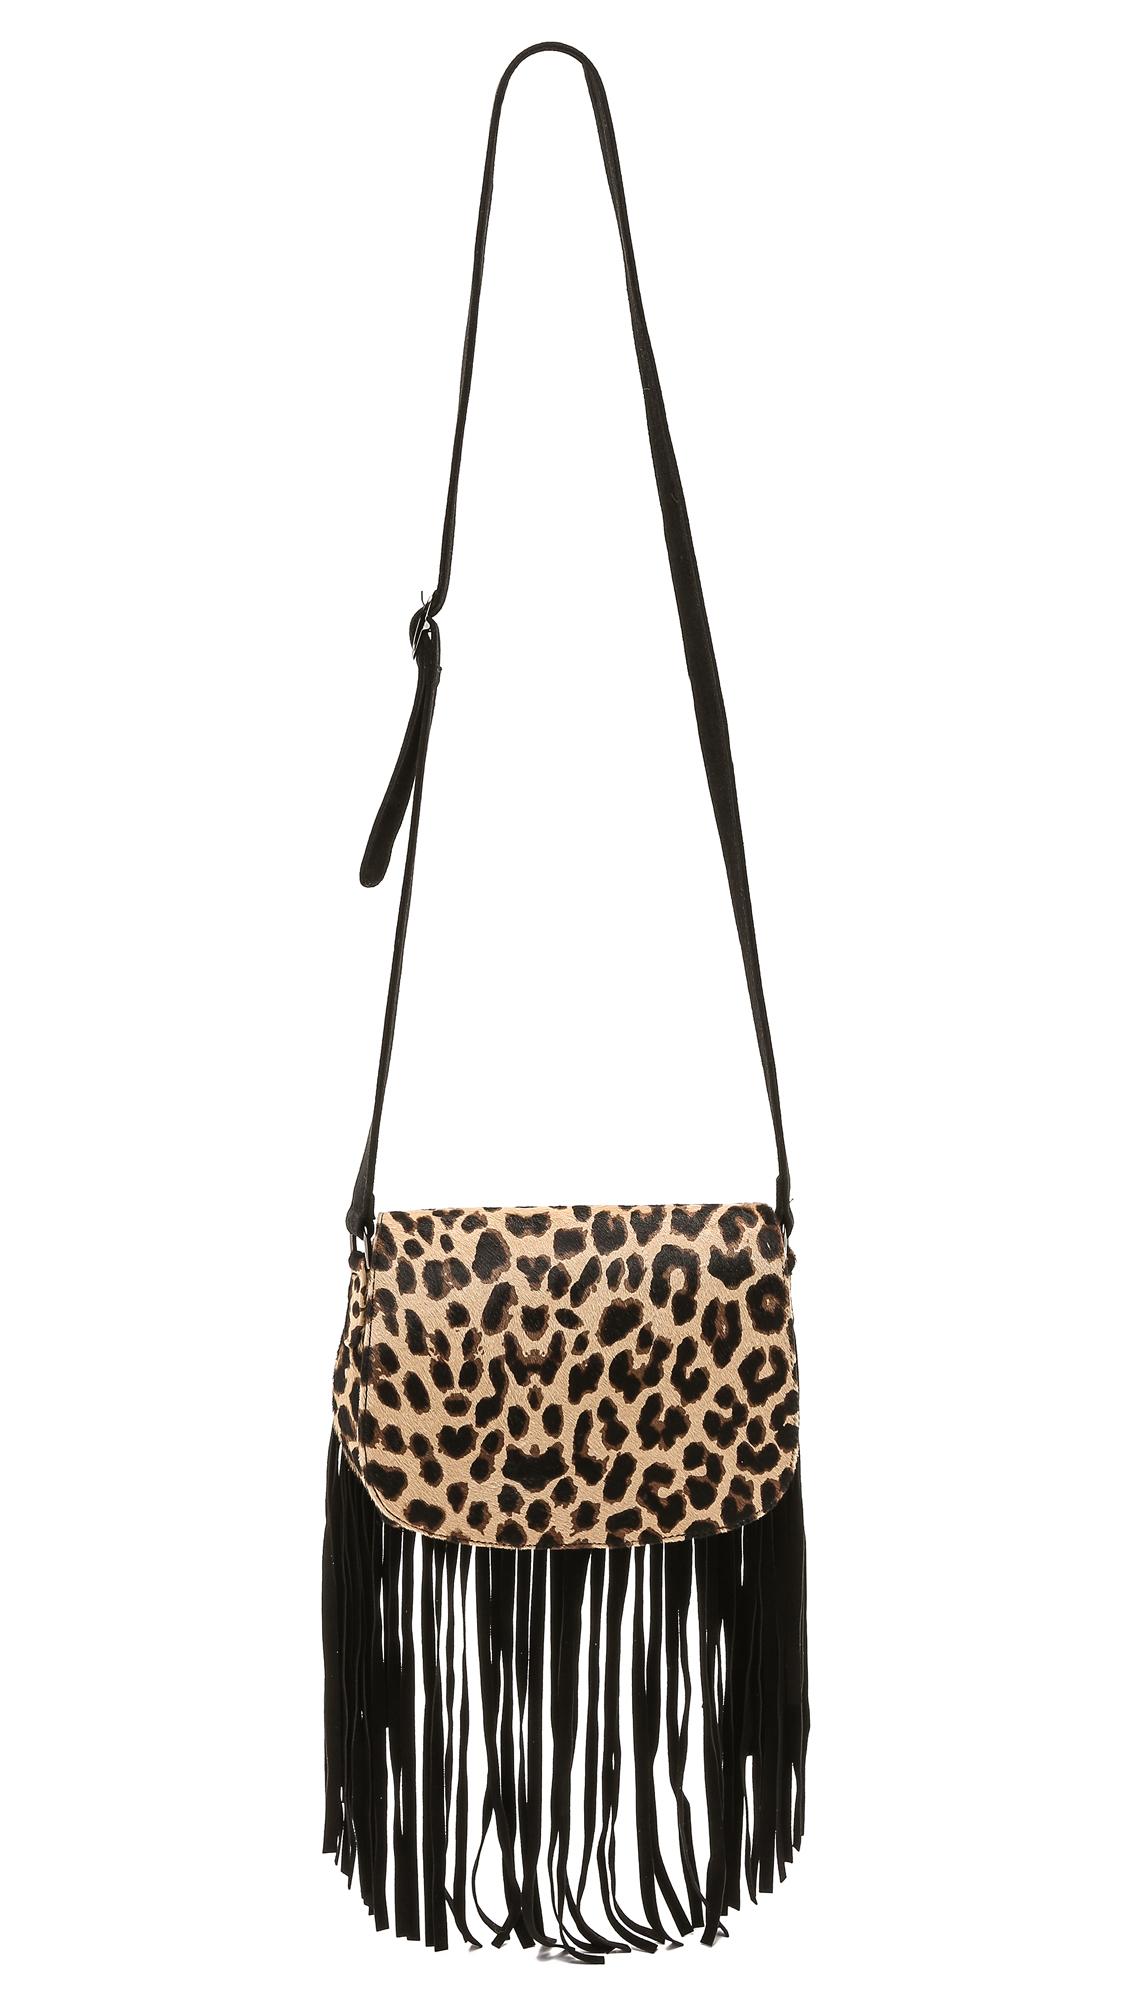 ThePerfext Sable Cross Body Bag - Leopard